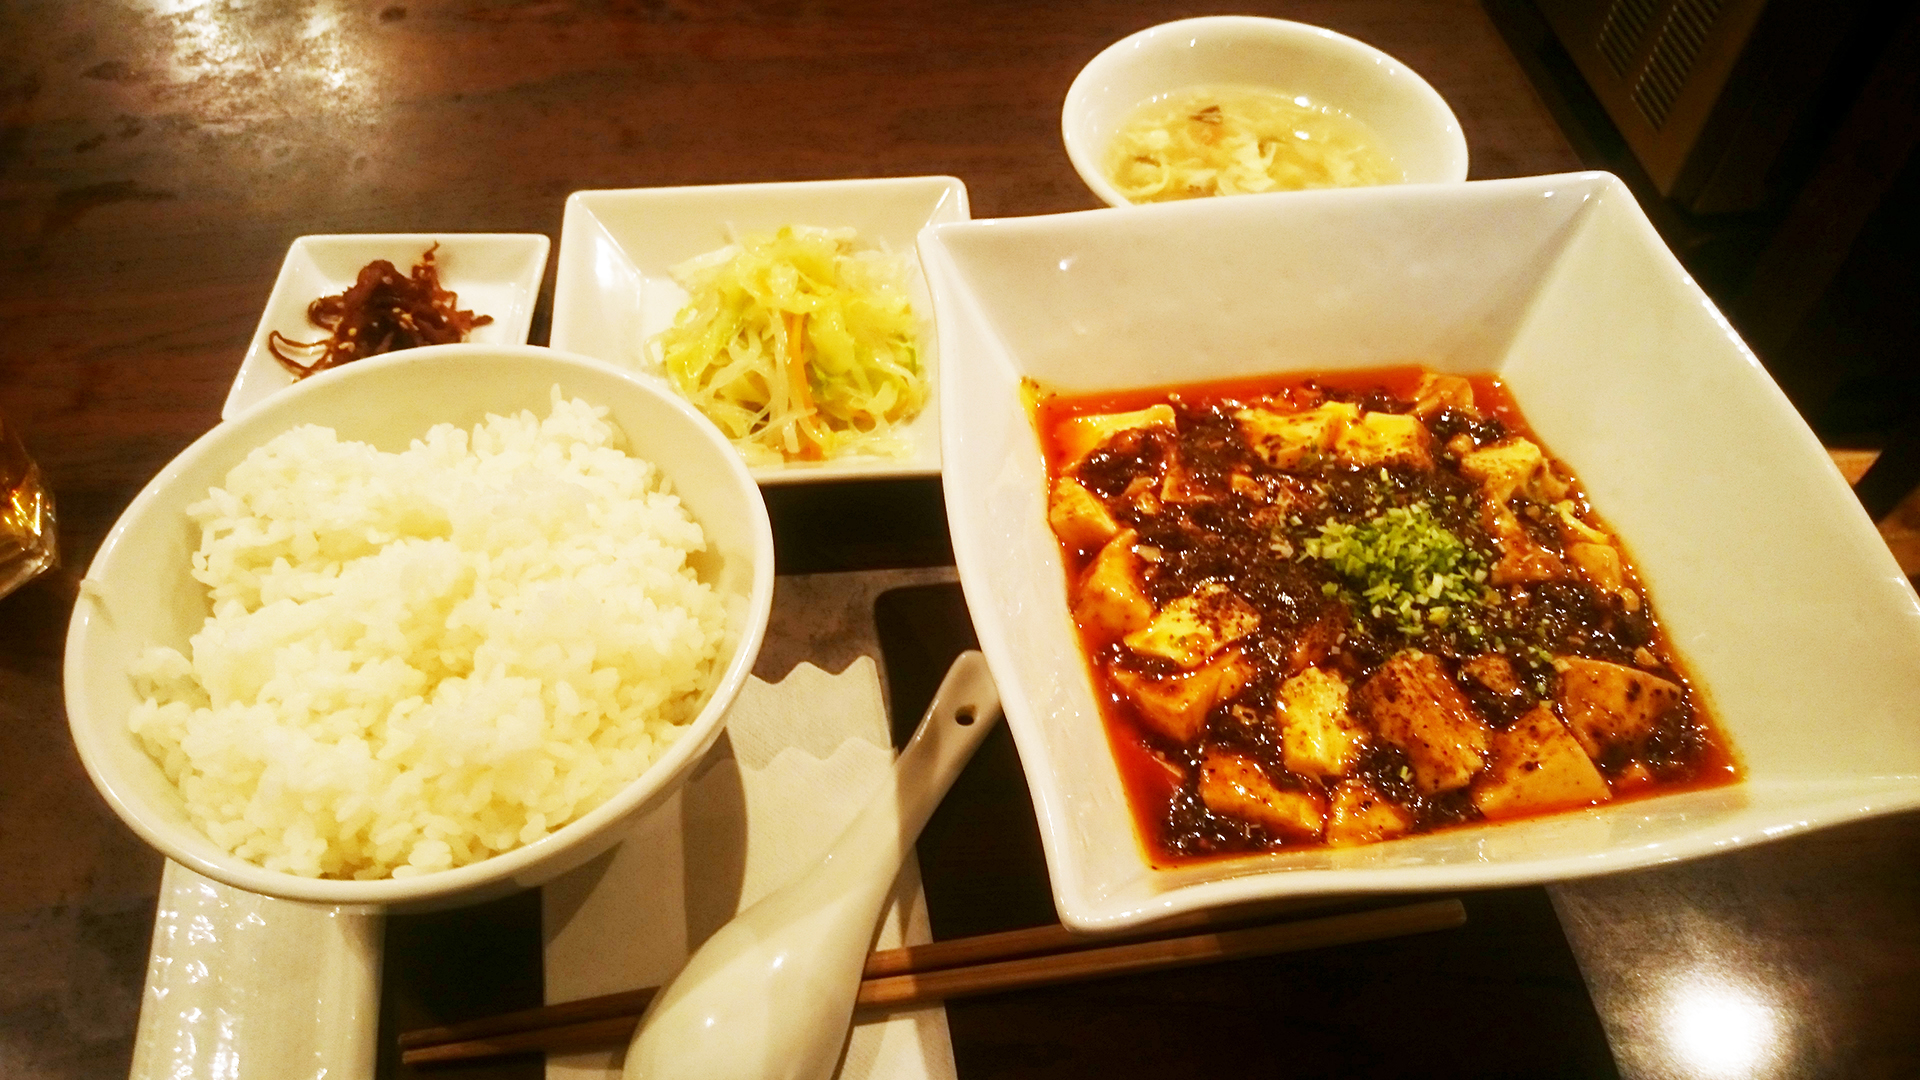 港区赤坂 同源の麻婆豆腐